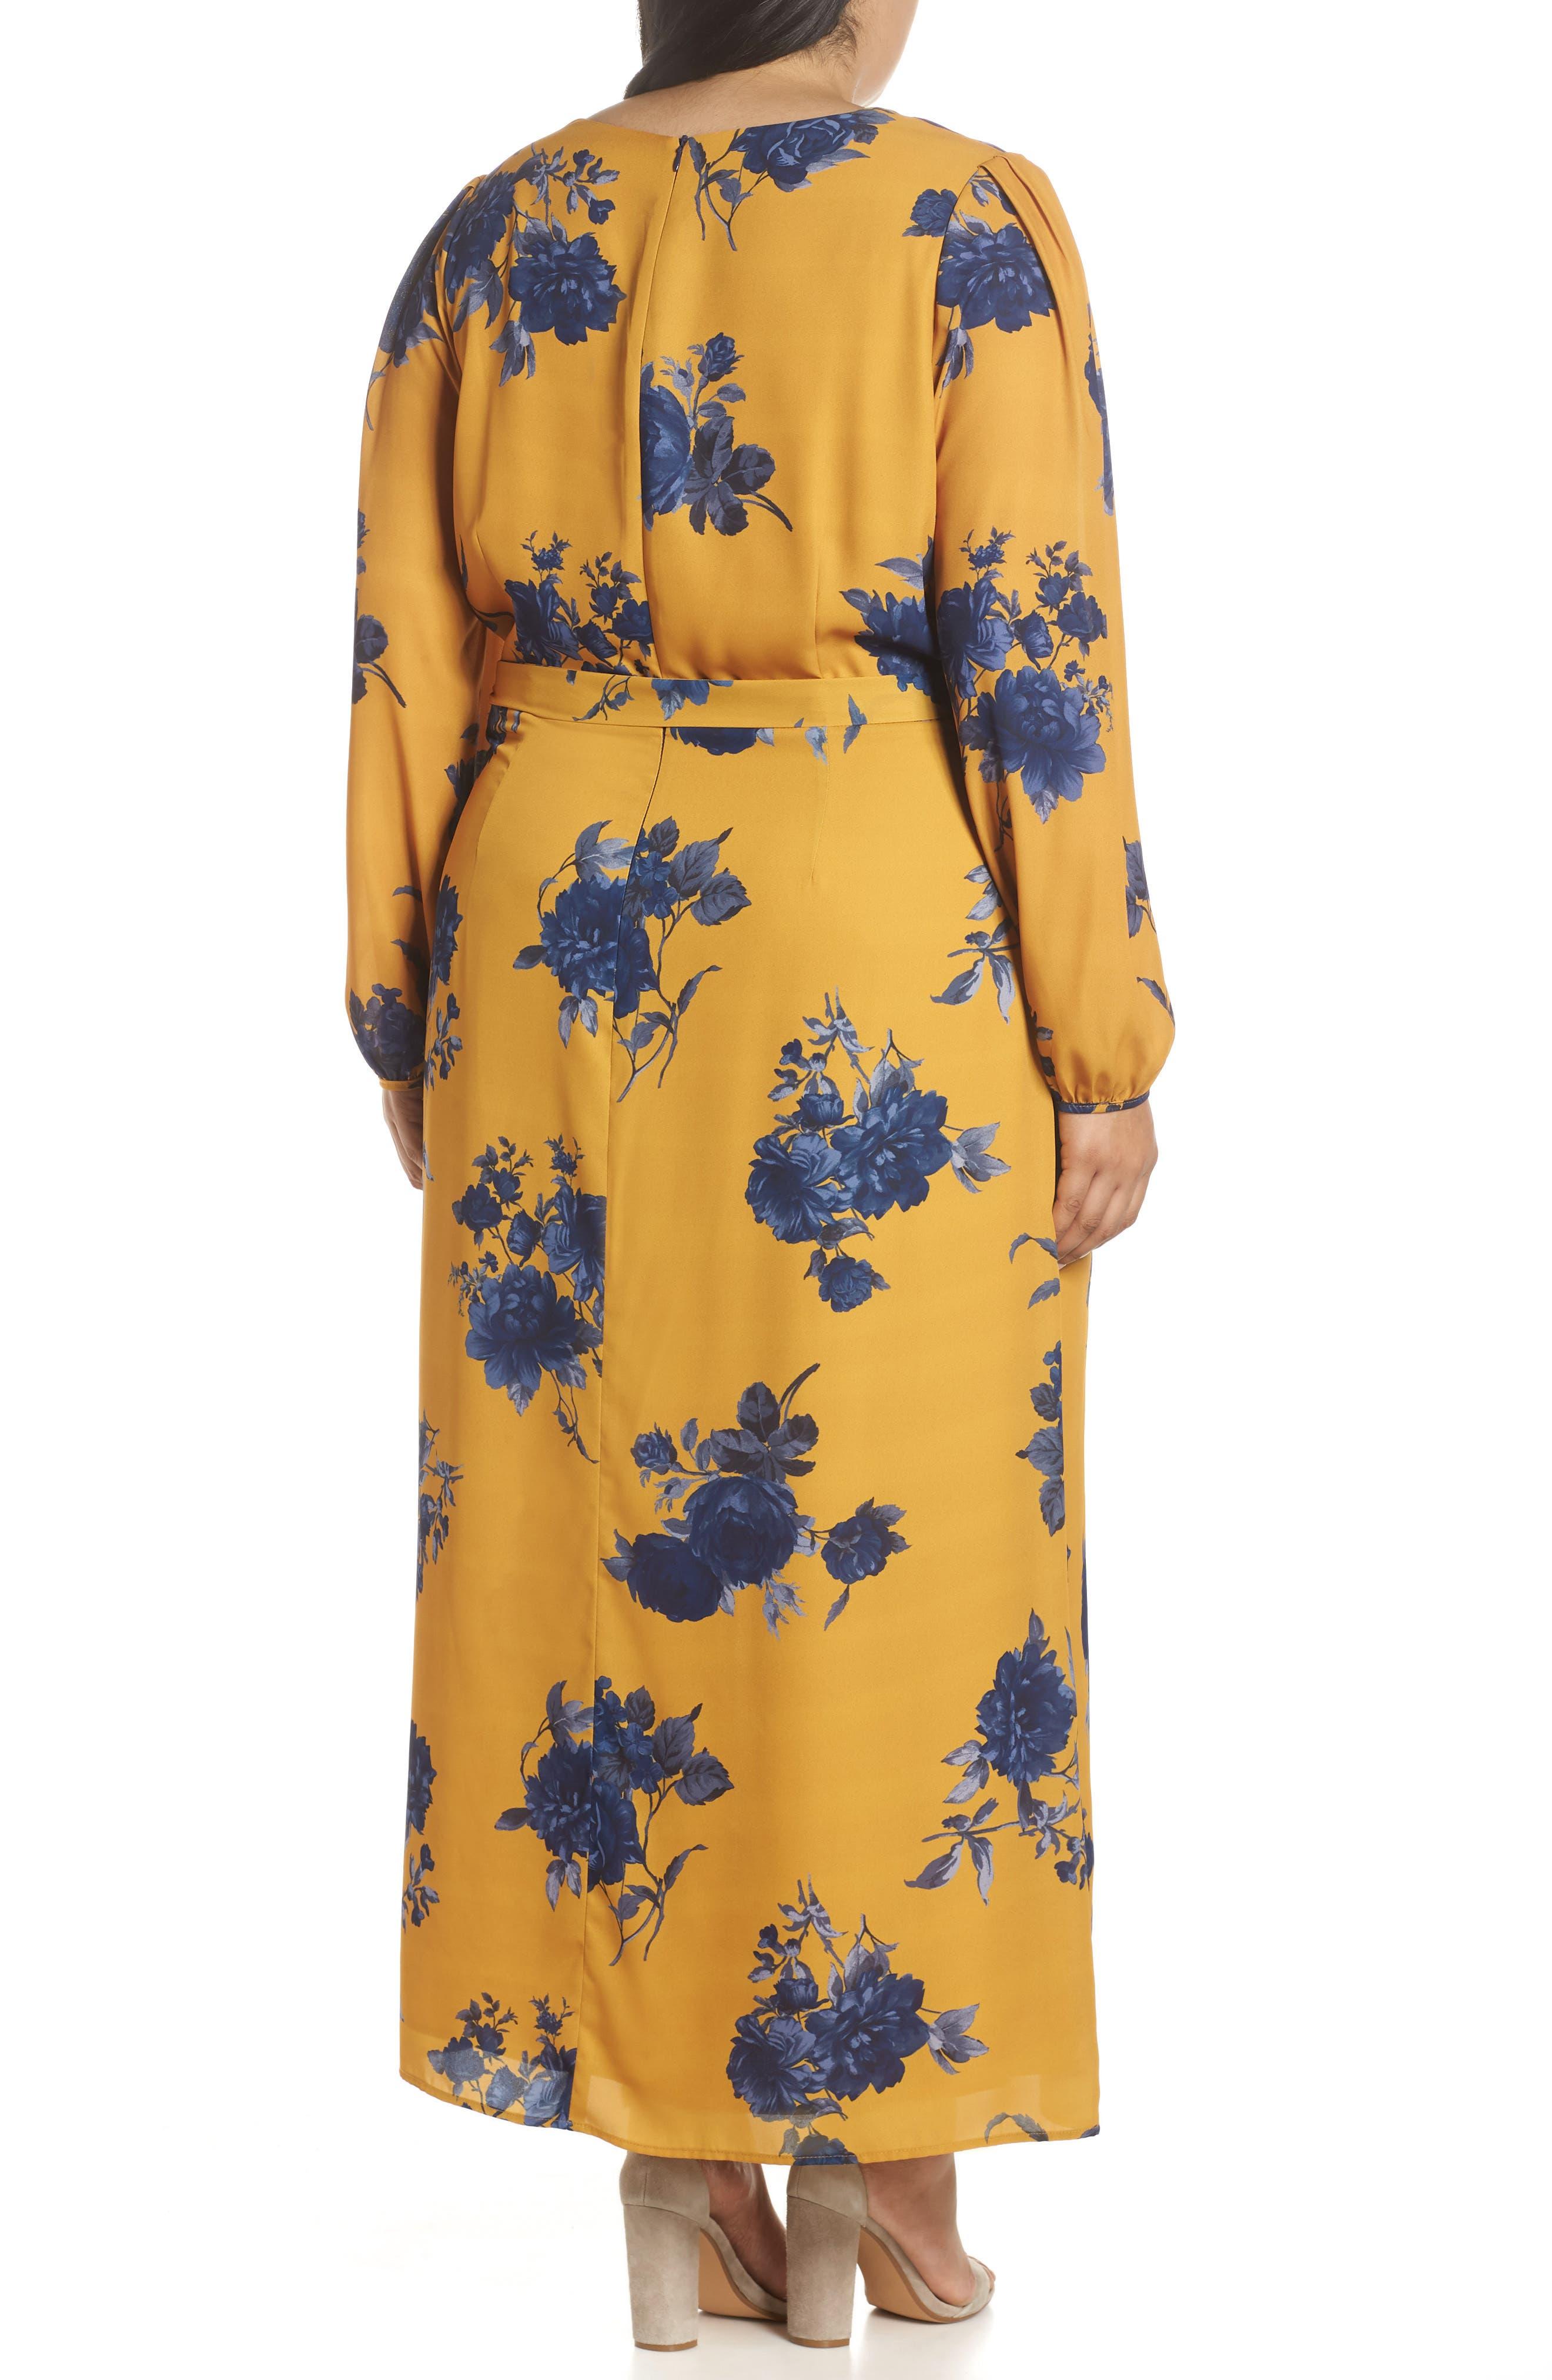 CHELSEA28,                             Floral Print Faux Wrap Maxi Dress,                             Alternate thumbnail 2, color,                             YELLOW NAVY